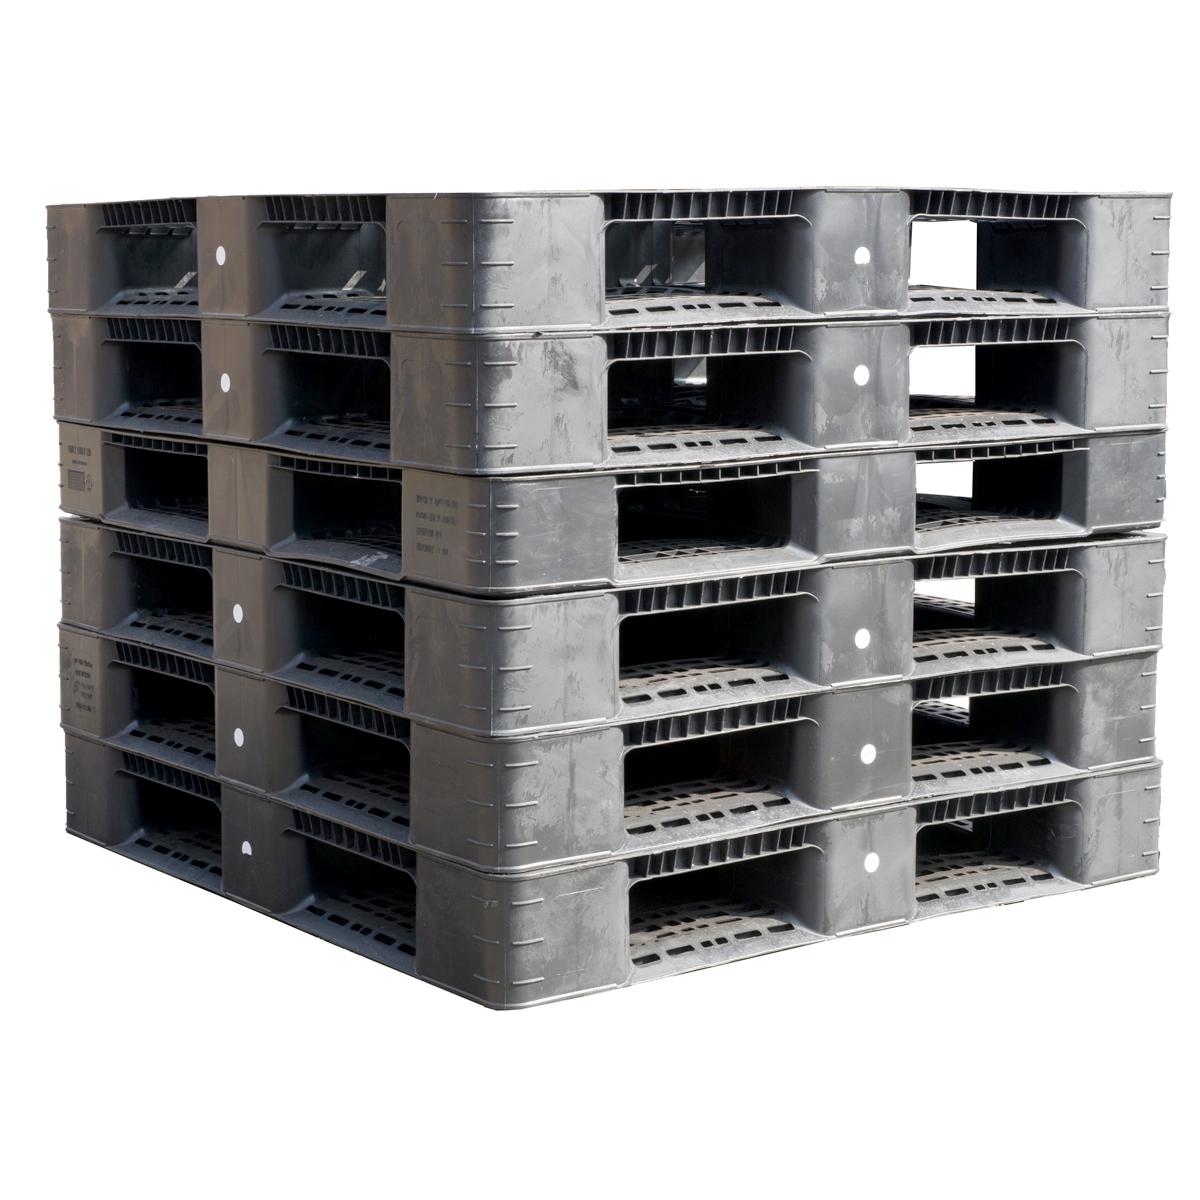 Plastic Pallets Standard And Bespoke